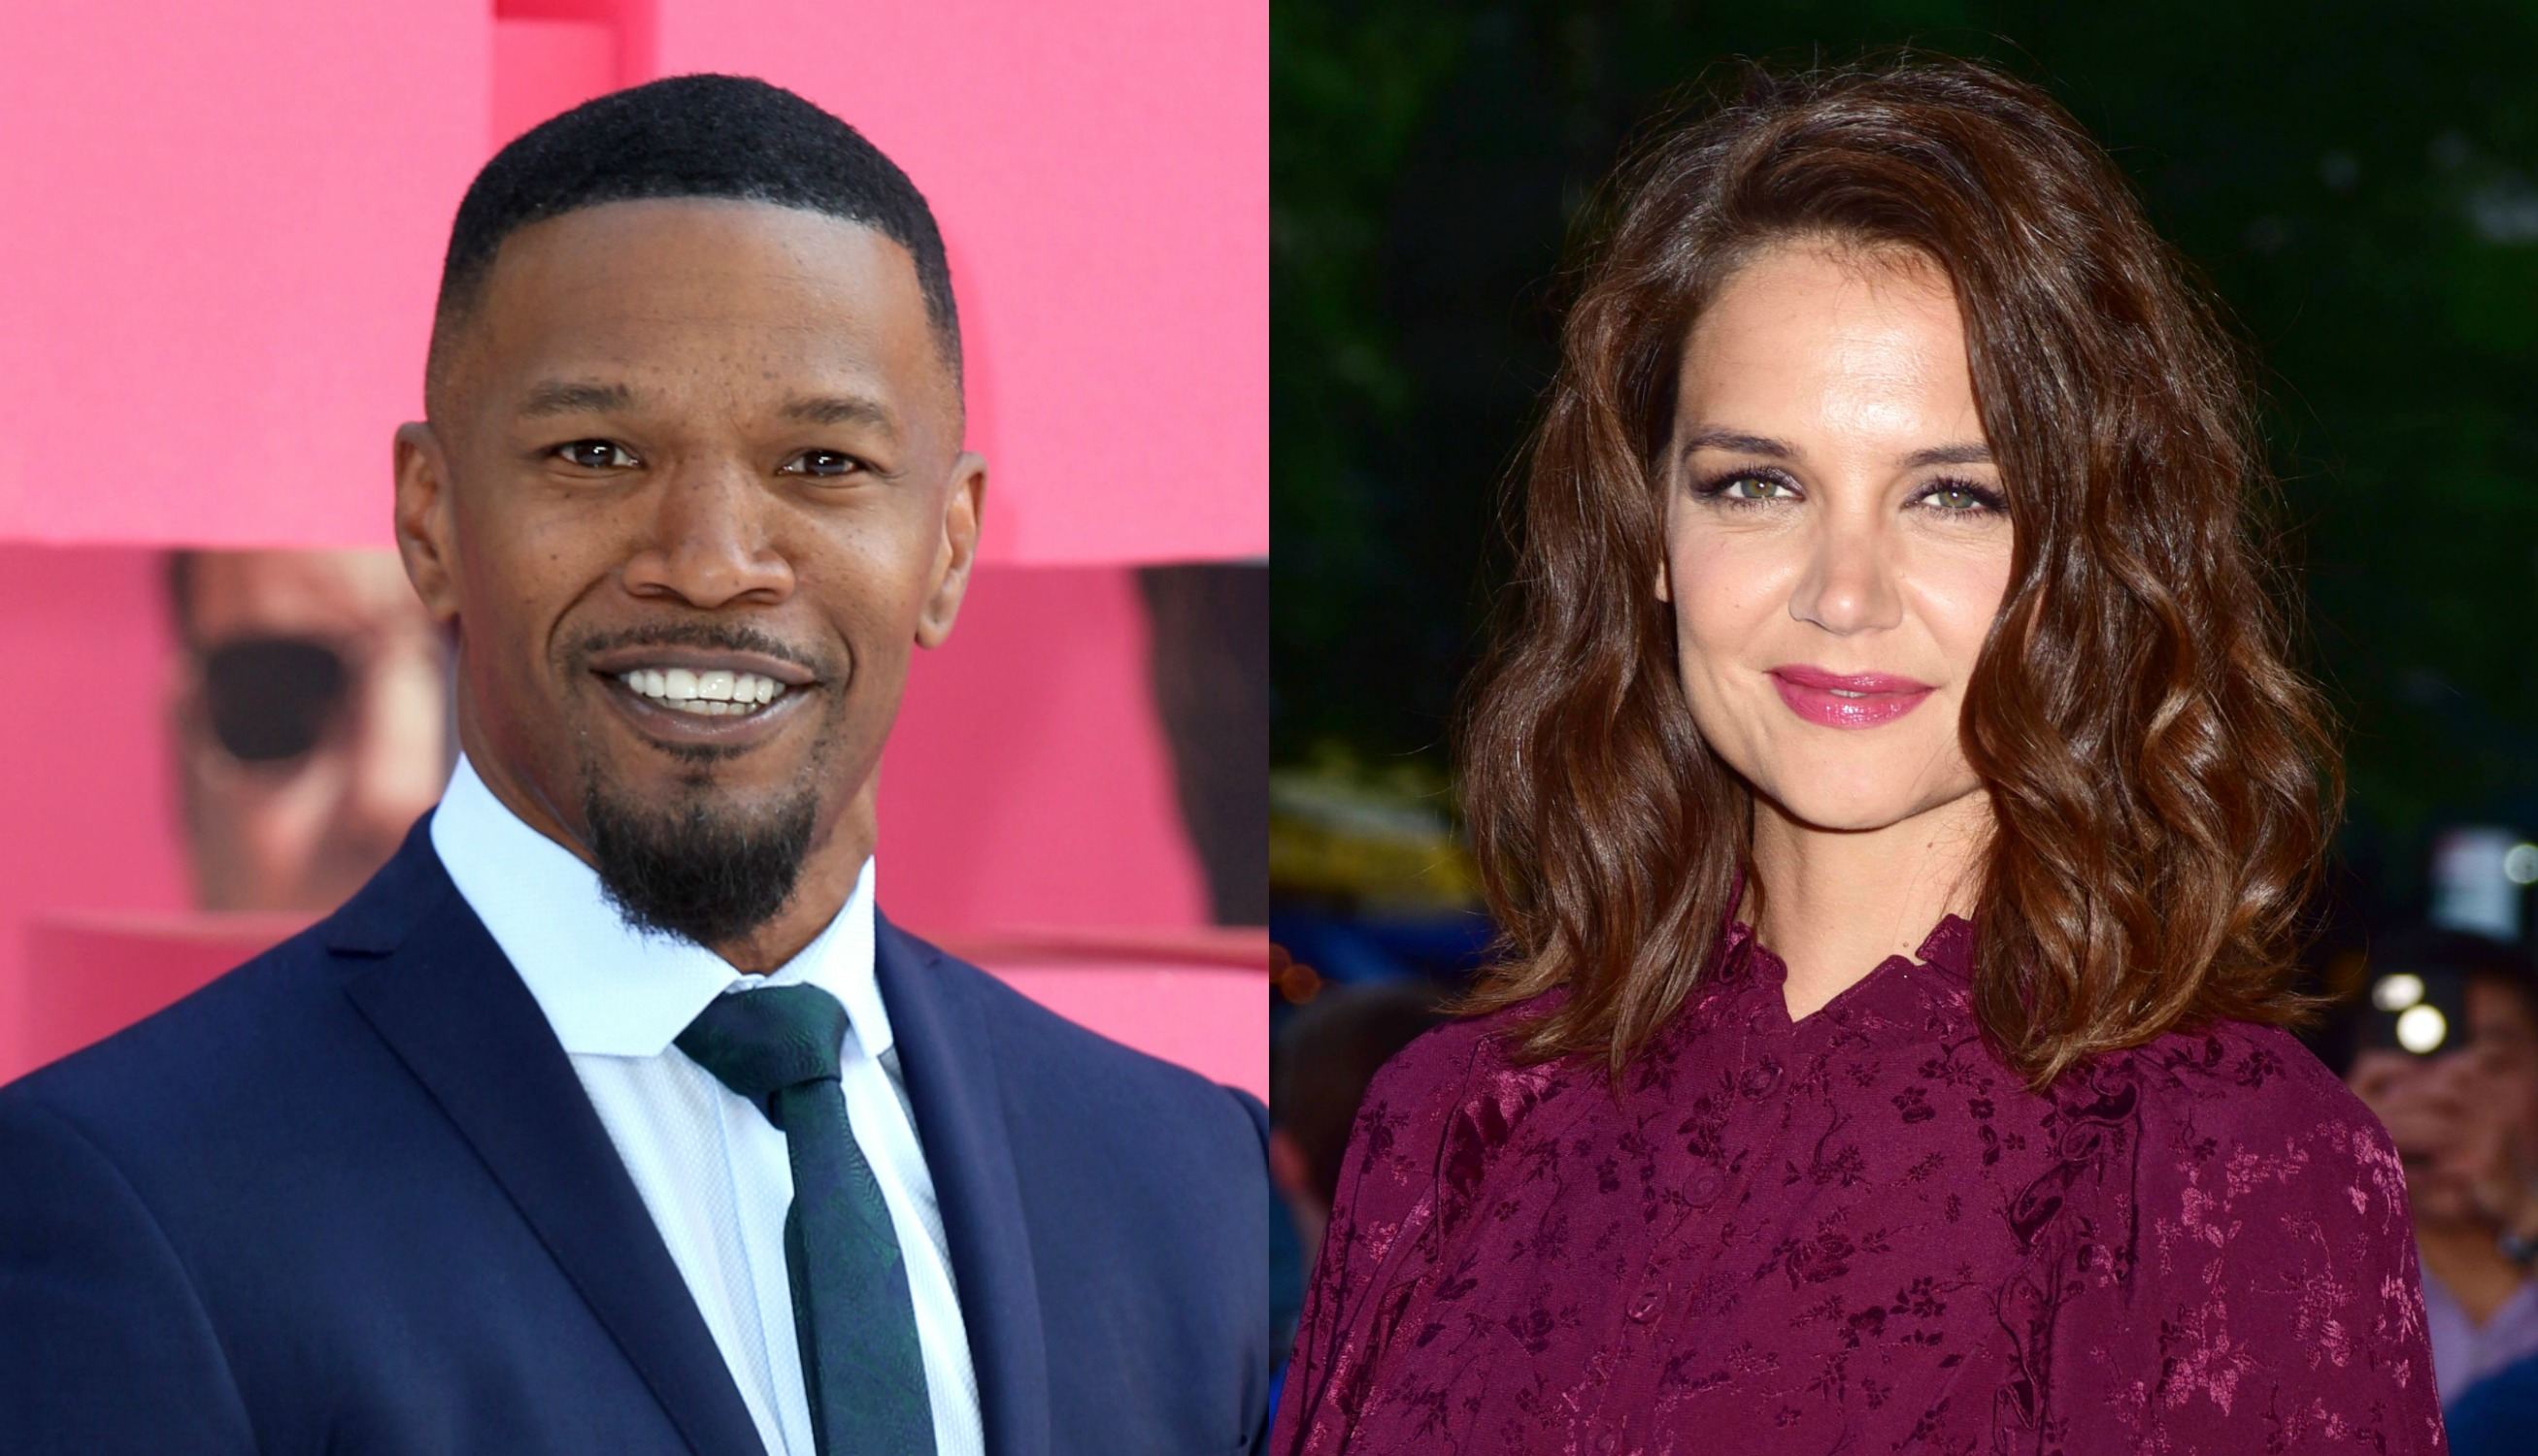 Jamie Foxx single? Star hints at Katie Holmes split at Oscars party